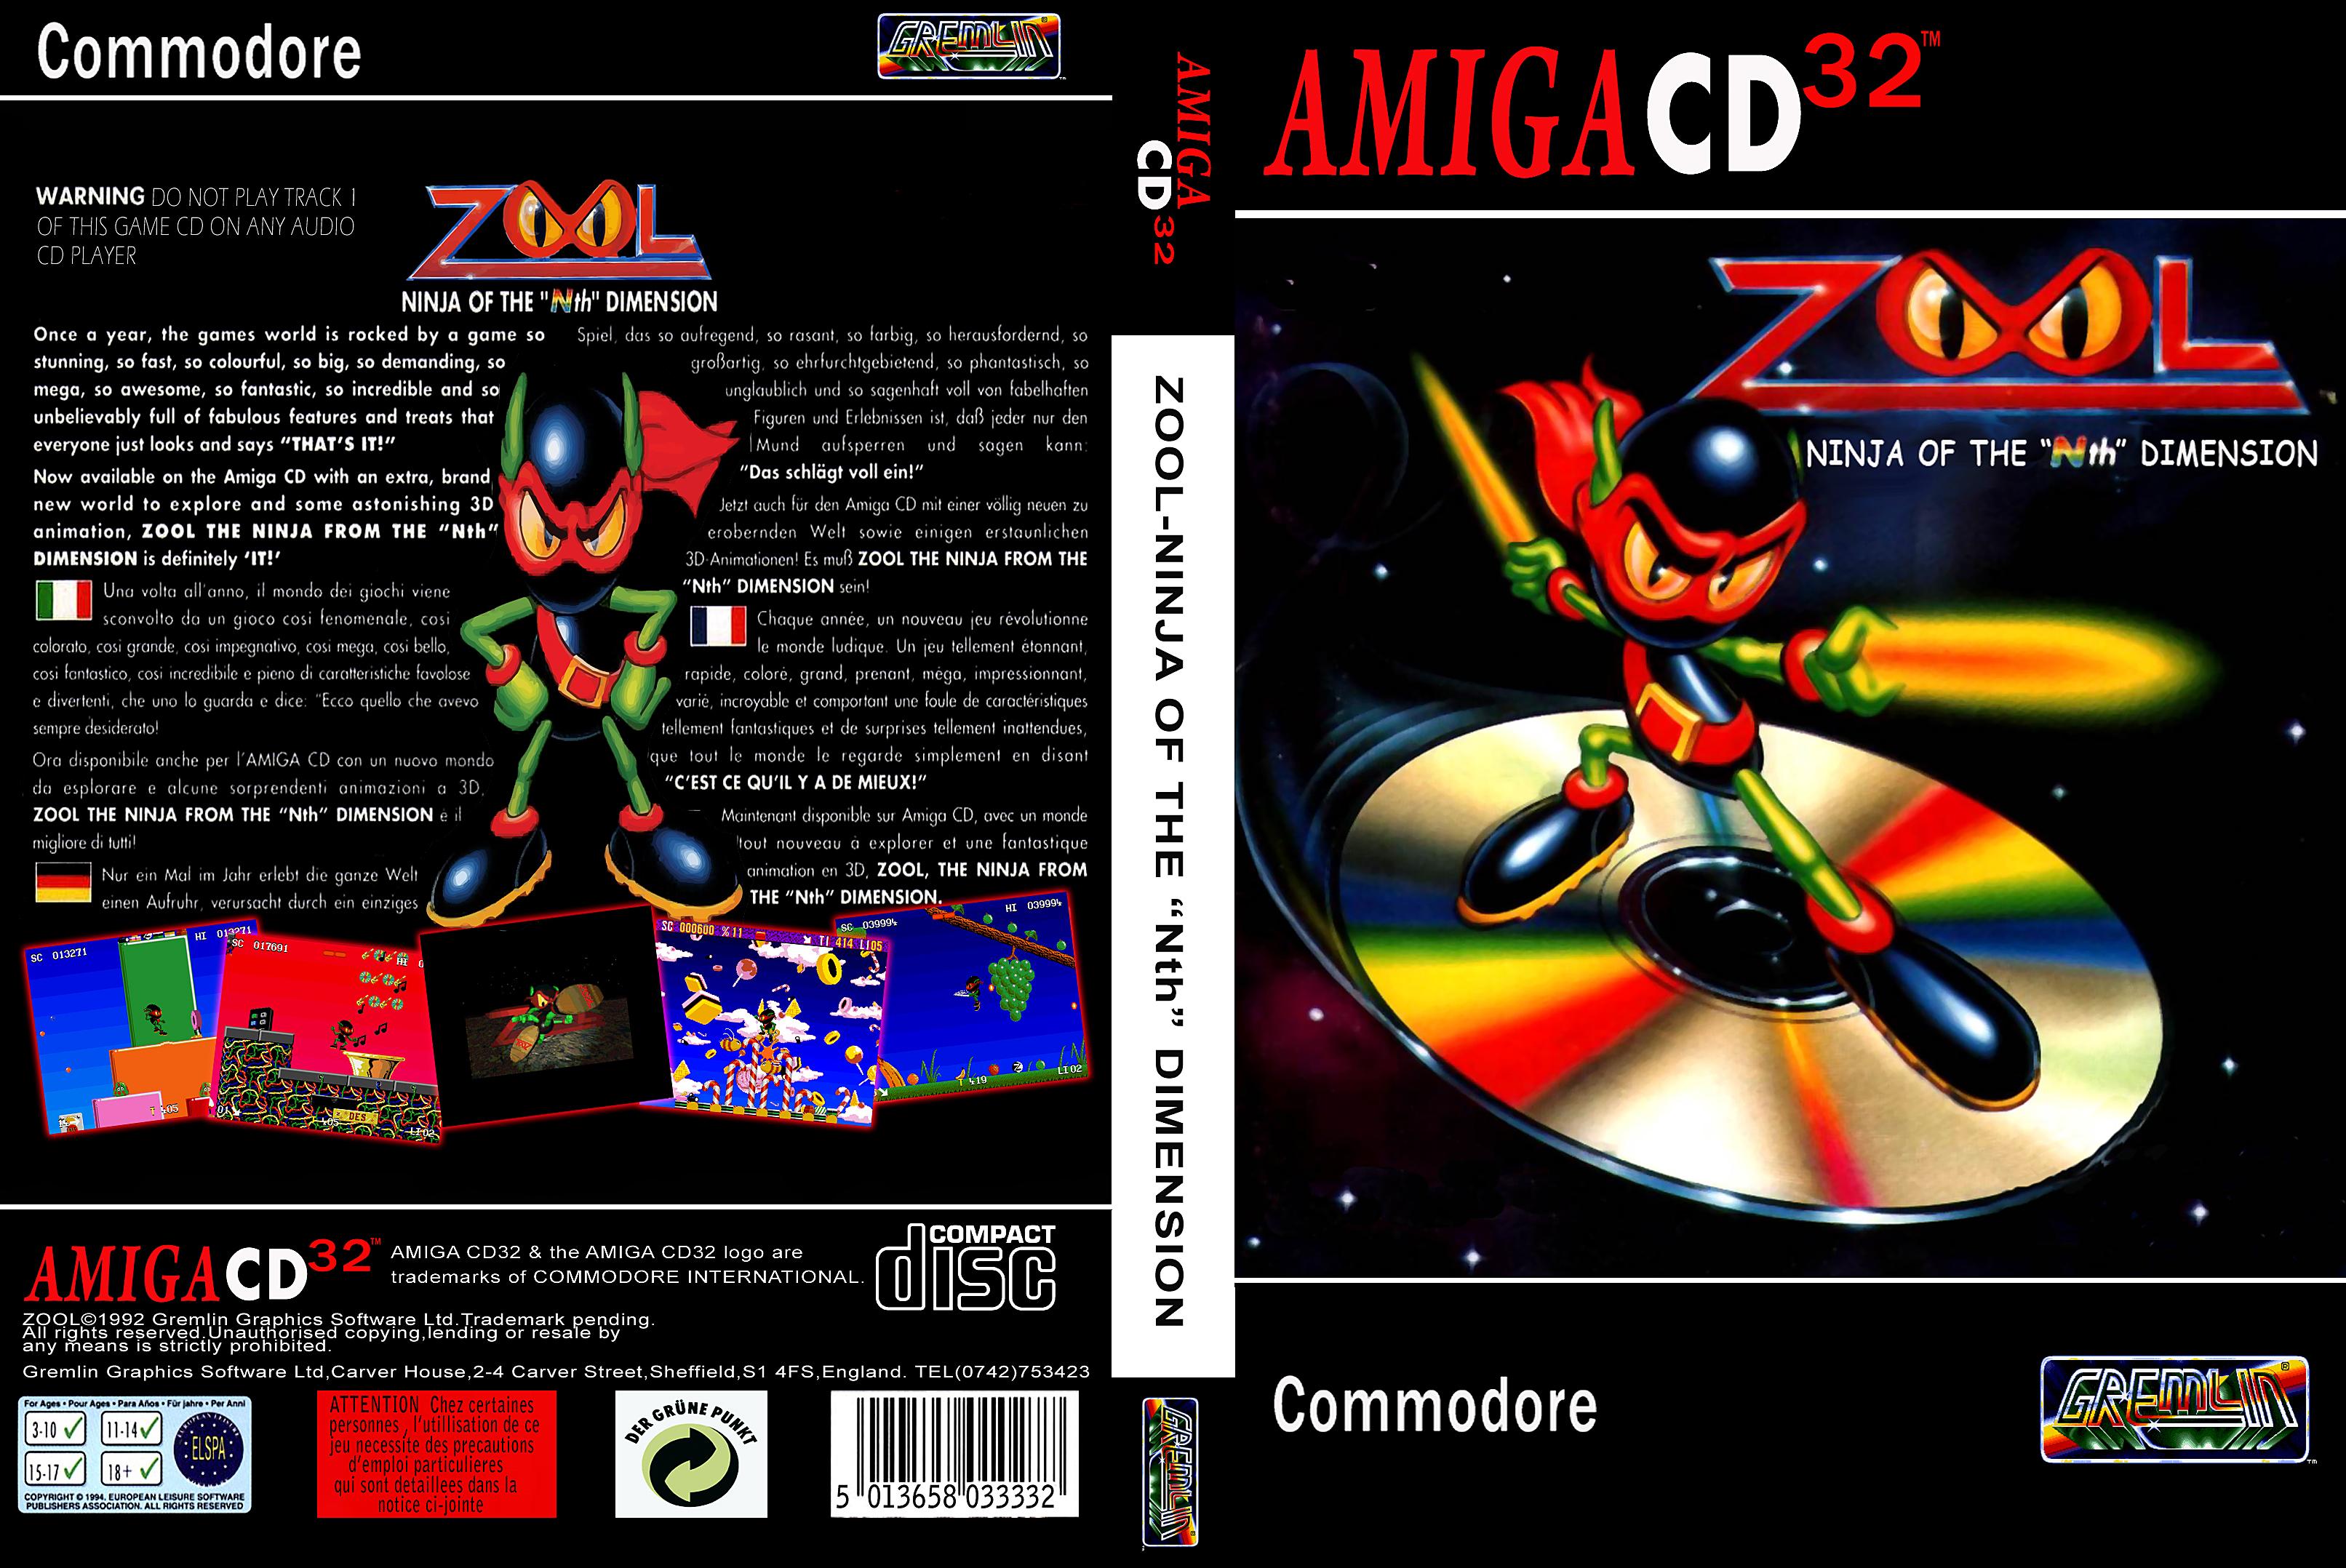 Commodore Amiga CD32 Game Covers Box Scans Box Art CD